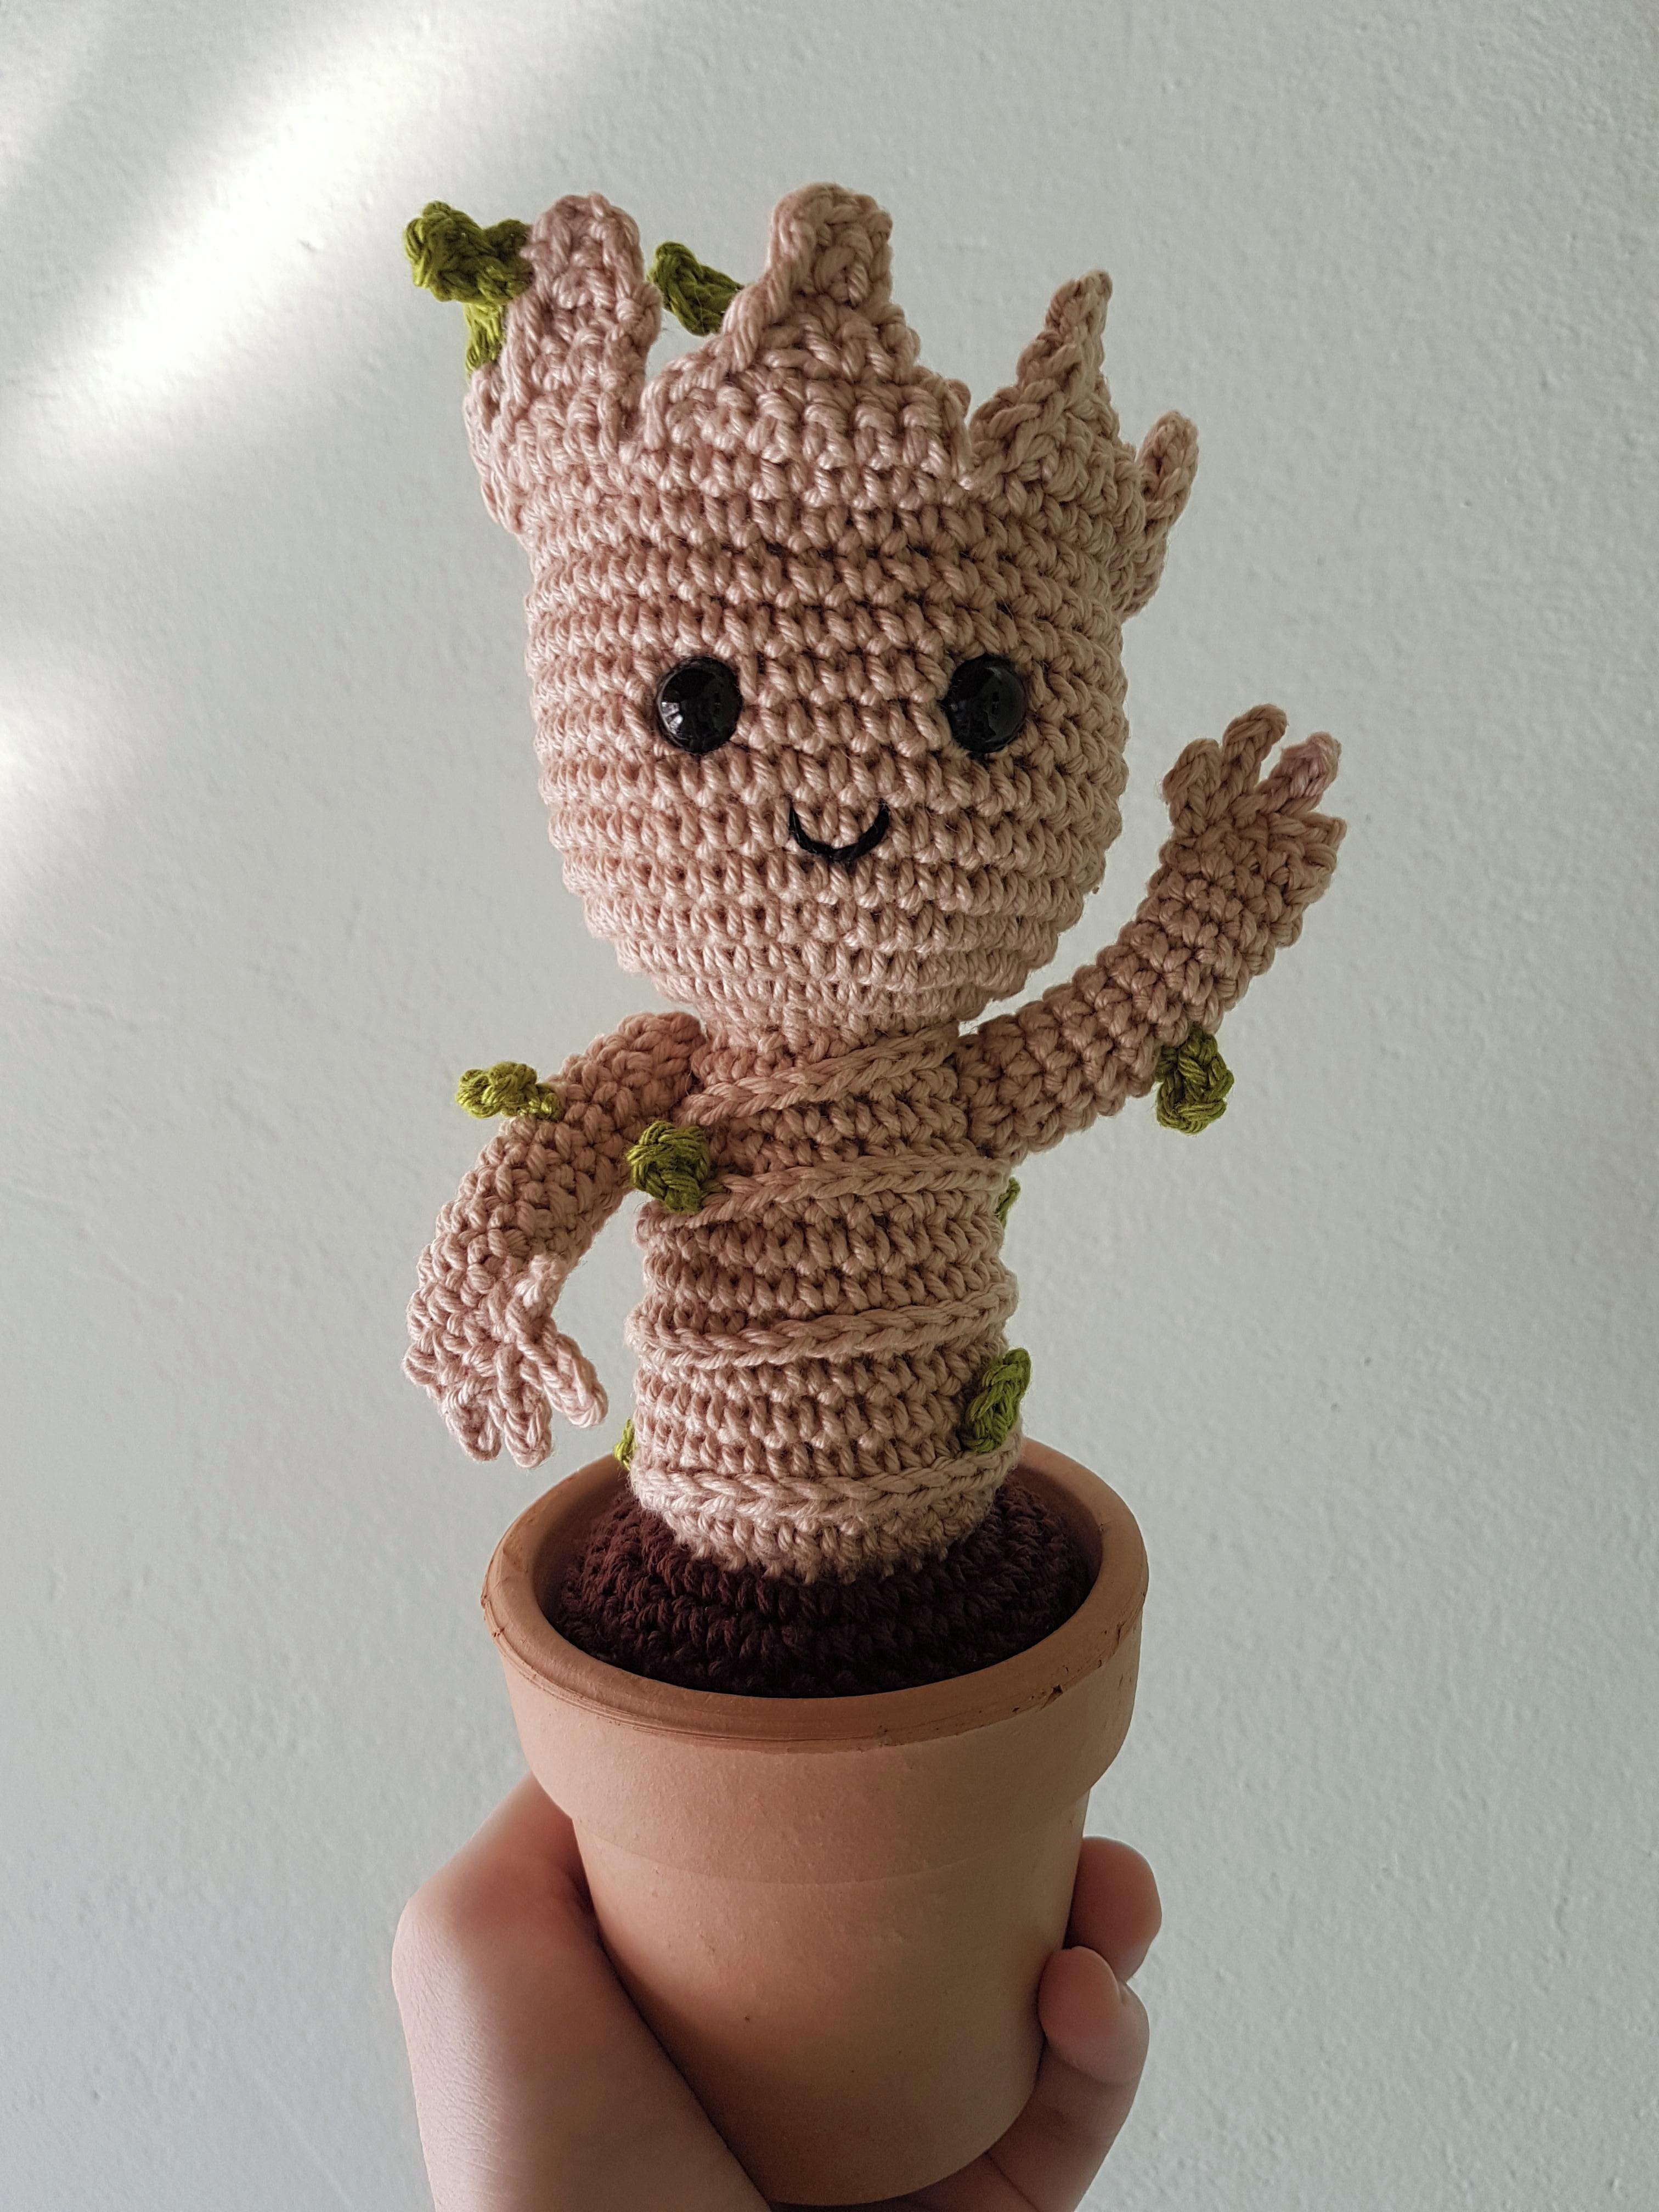 Baby Groot Keyring Free Pattern – Handmade Crochet Amigurumi ... | 4032x3024